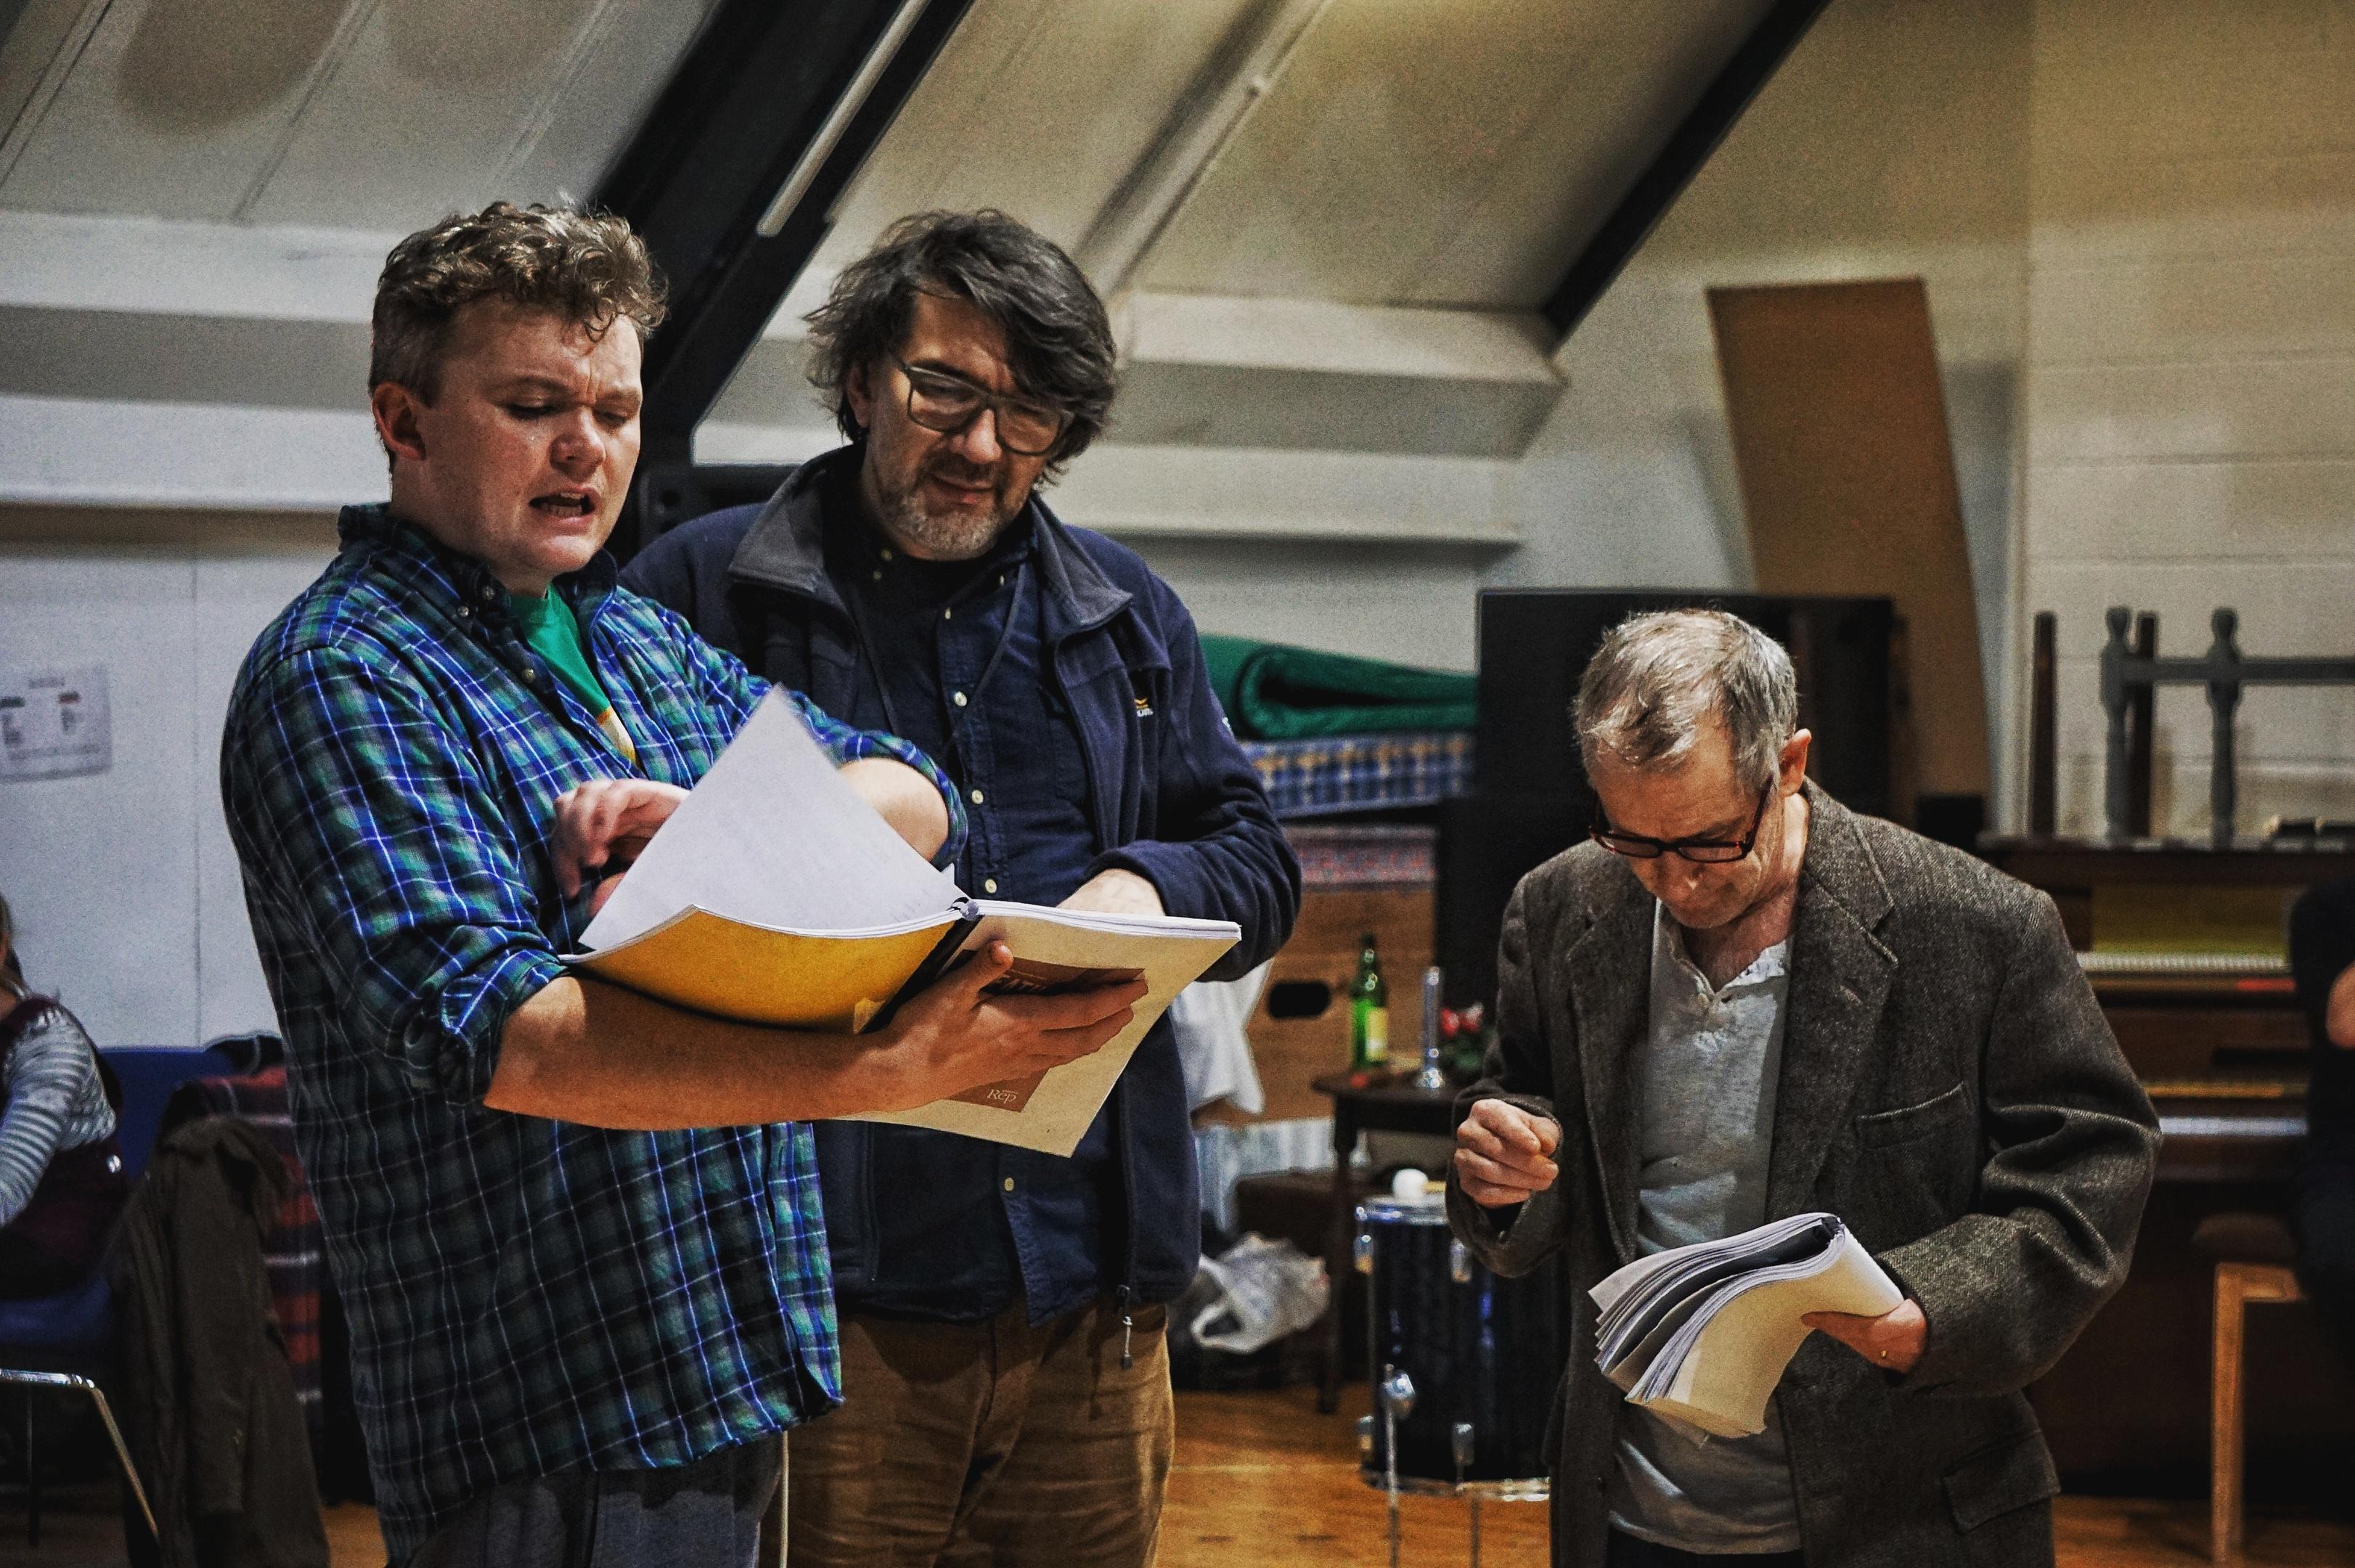 Joe Douglas, Nikola Kodjabashia and Billy Mack during rehearsals for Death of a Salesman.